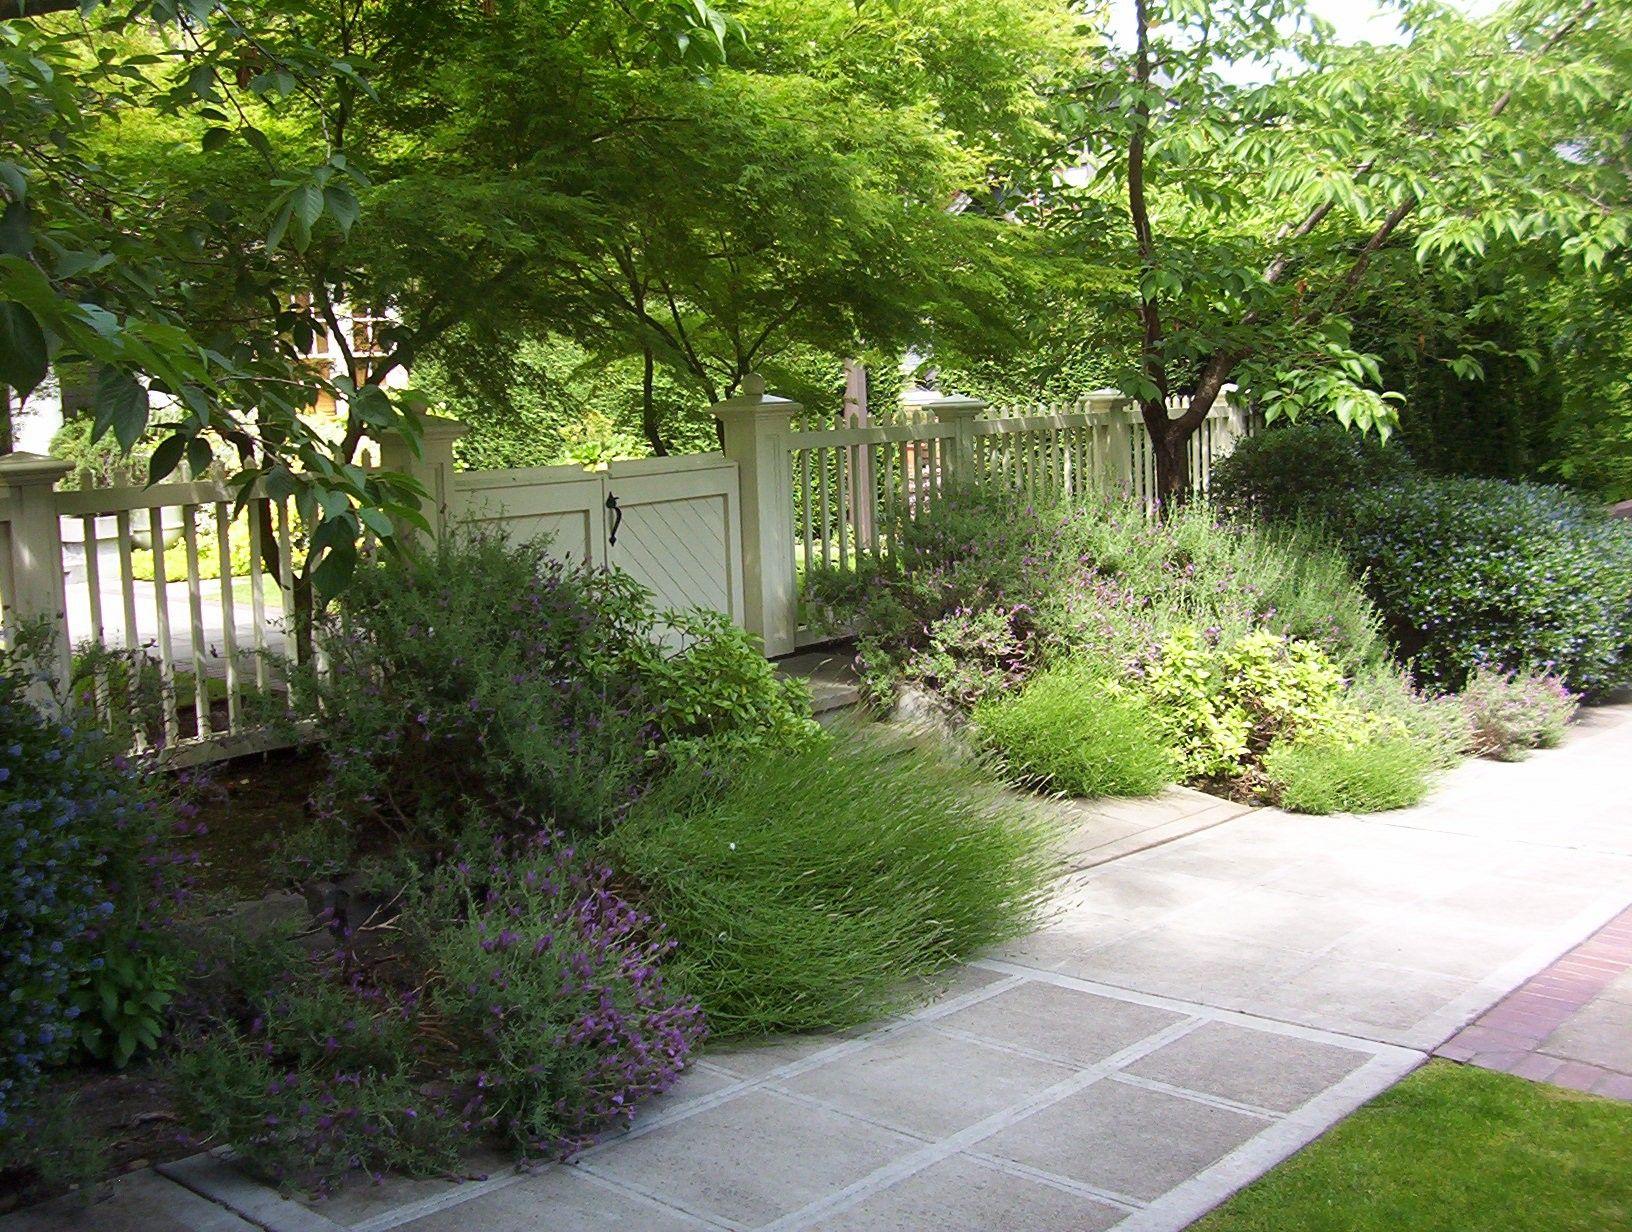 12 inspiring ideas for a lawn free landscape gardening garden on a hill front yard. Black Bedroom Furniture Sets. Home Design Ideas